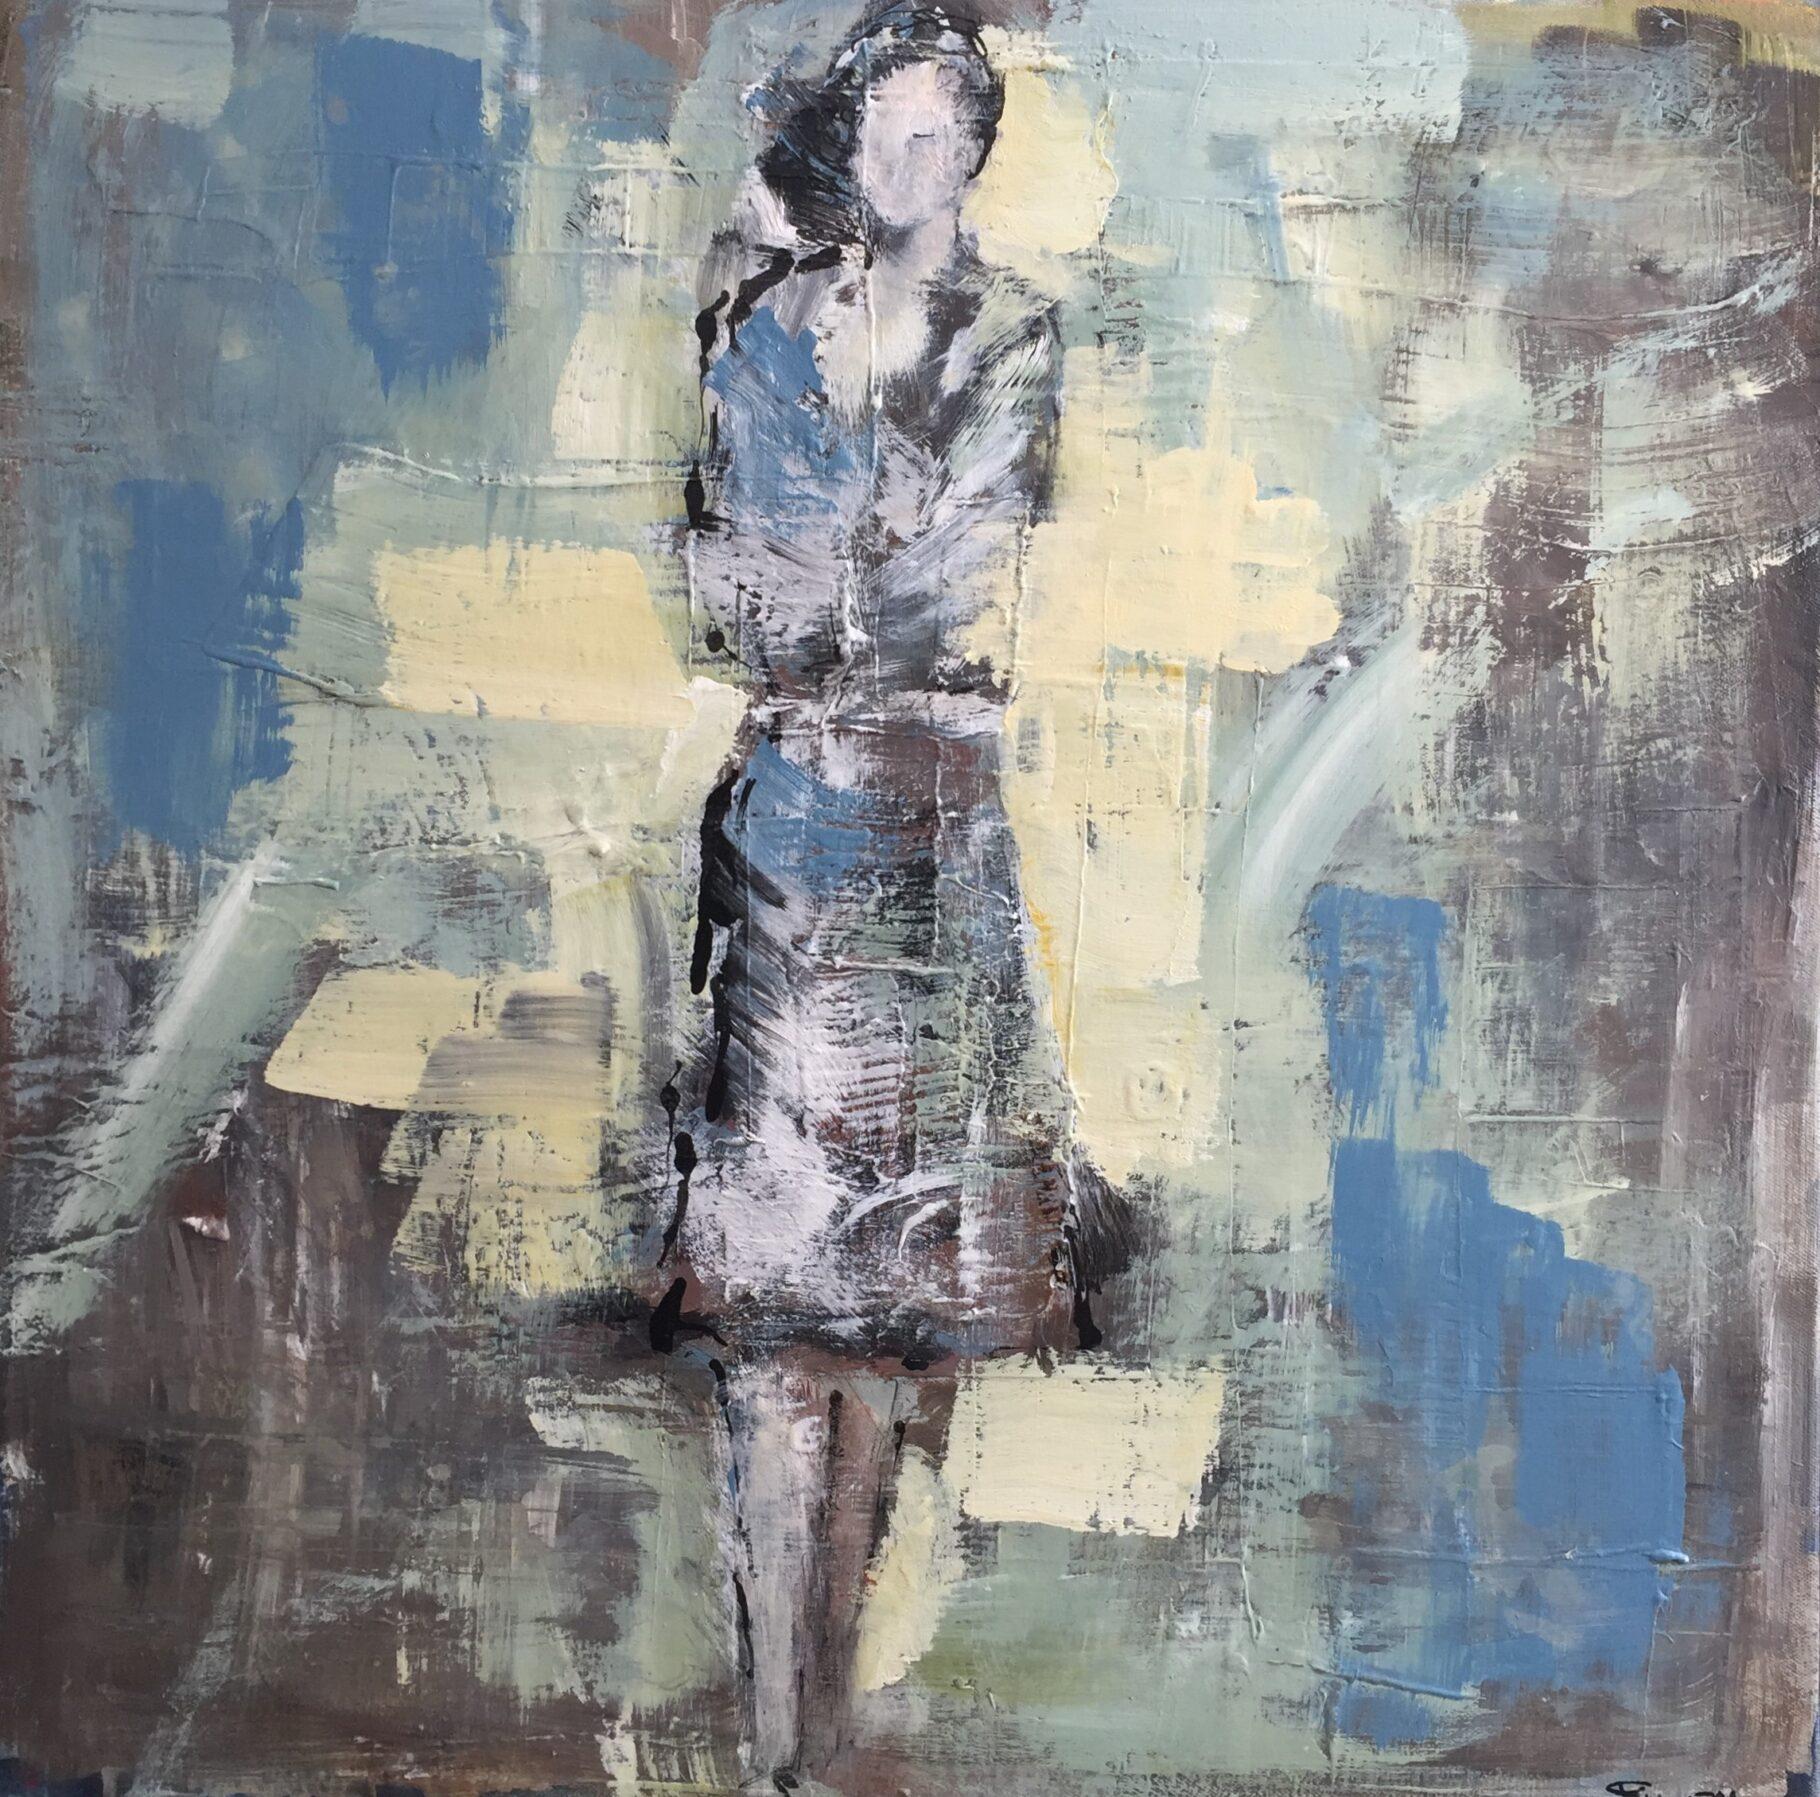 Kari Swanson, Through It All